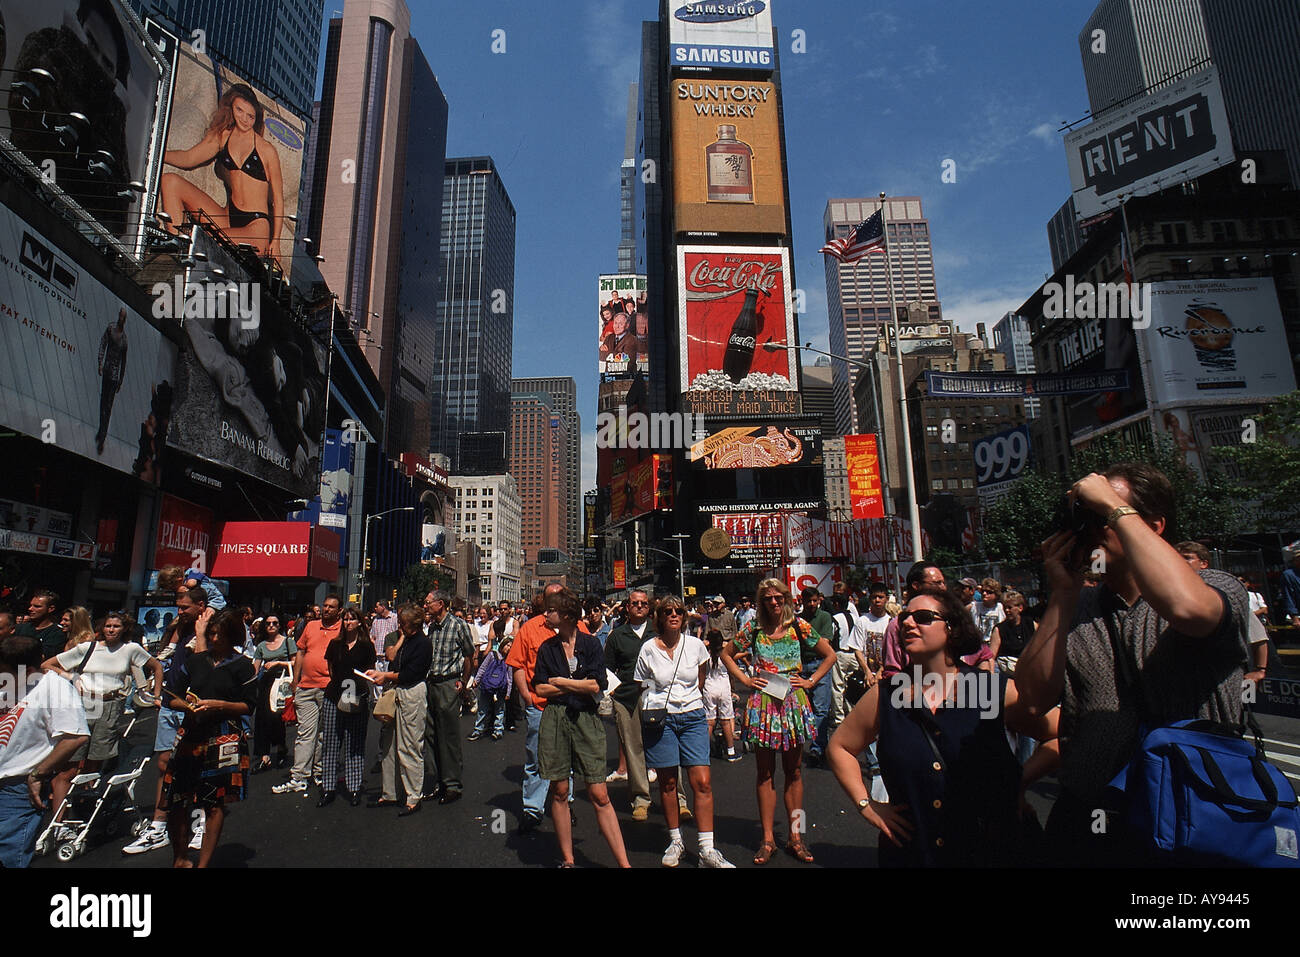 Werbeplakate Stock Photos & Werbeplakate Stock Images - Alamy